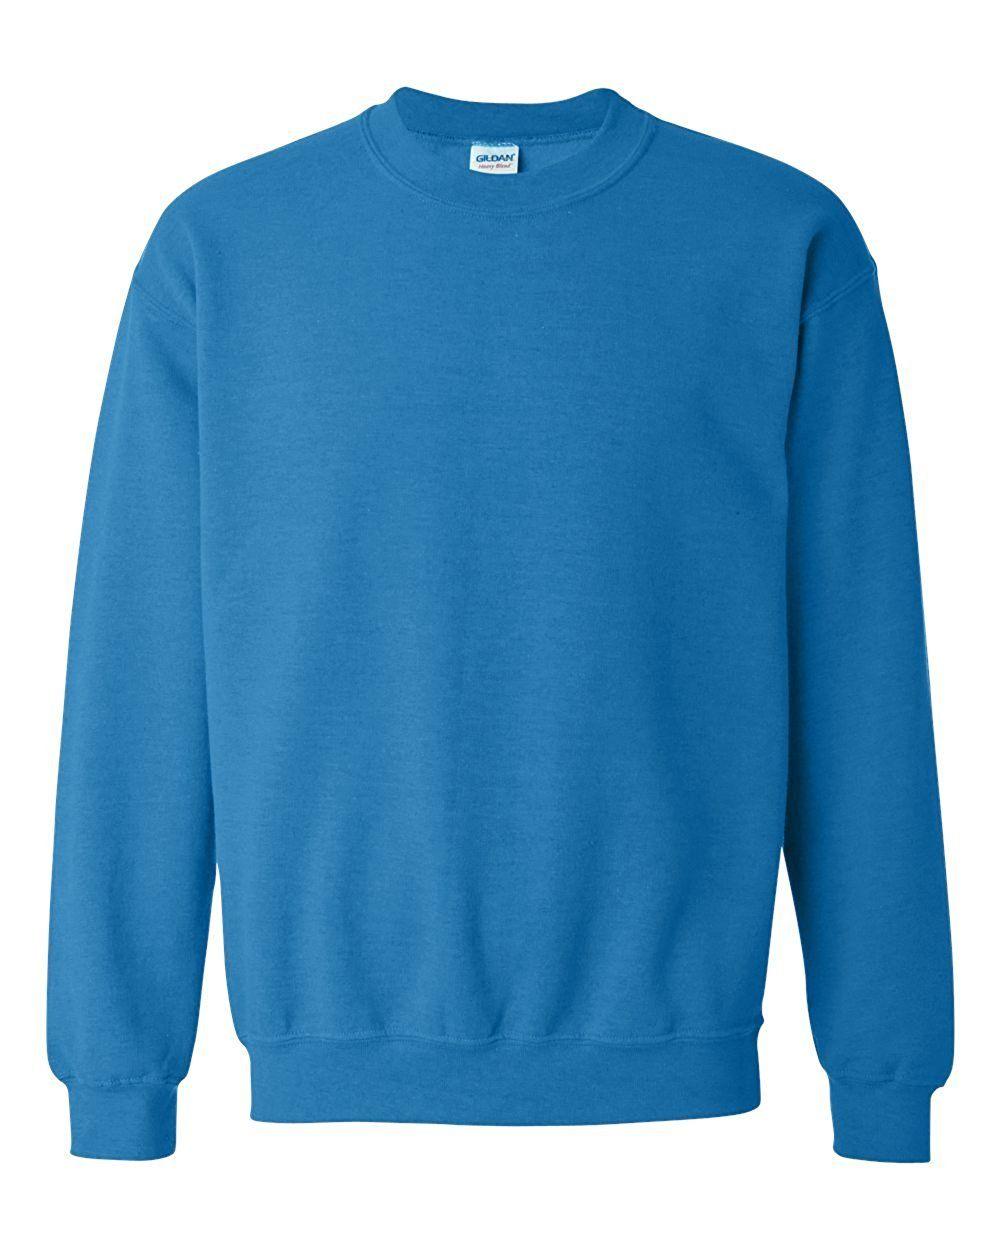 Amazon Com Gildan Men 39 S Heavy Blend Crewneck Sweatshirt Clothing Sweatshirts Printed Sweatshirts Crew Neck Sweatshirt [ 1250 x 1000 Pixel ]